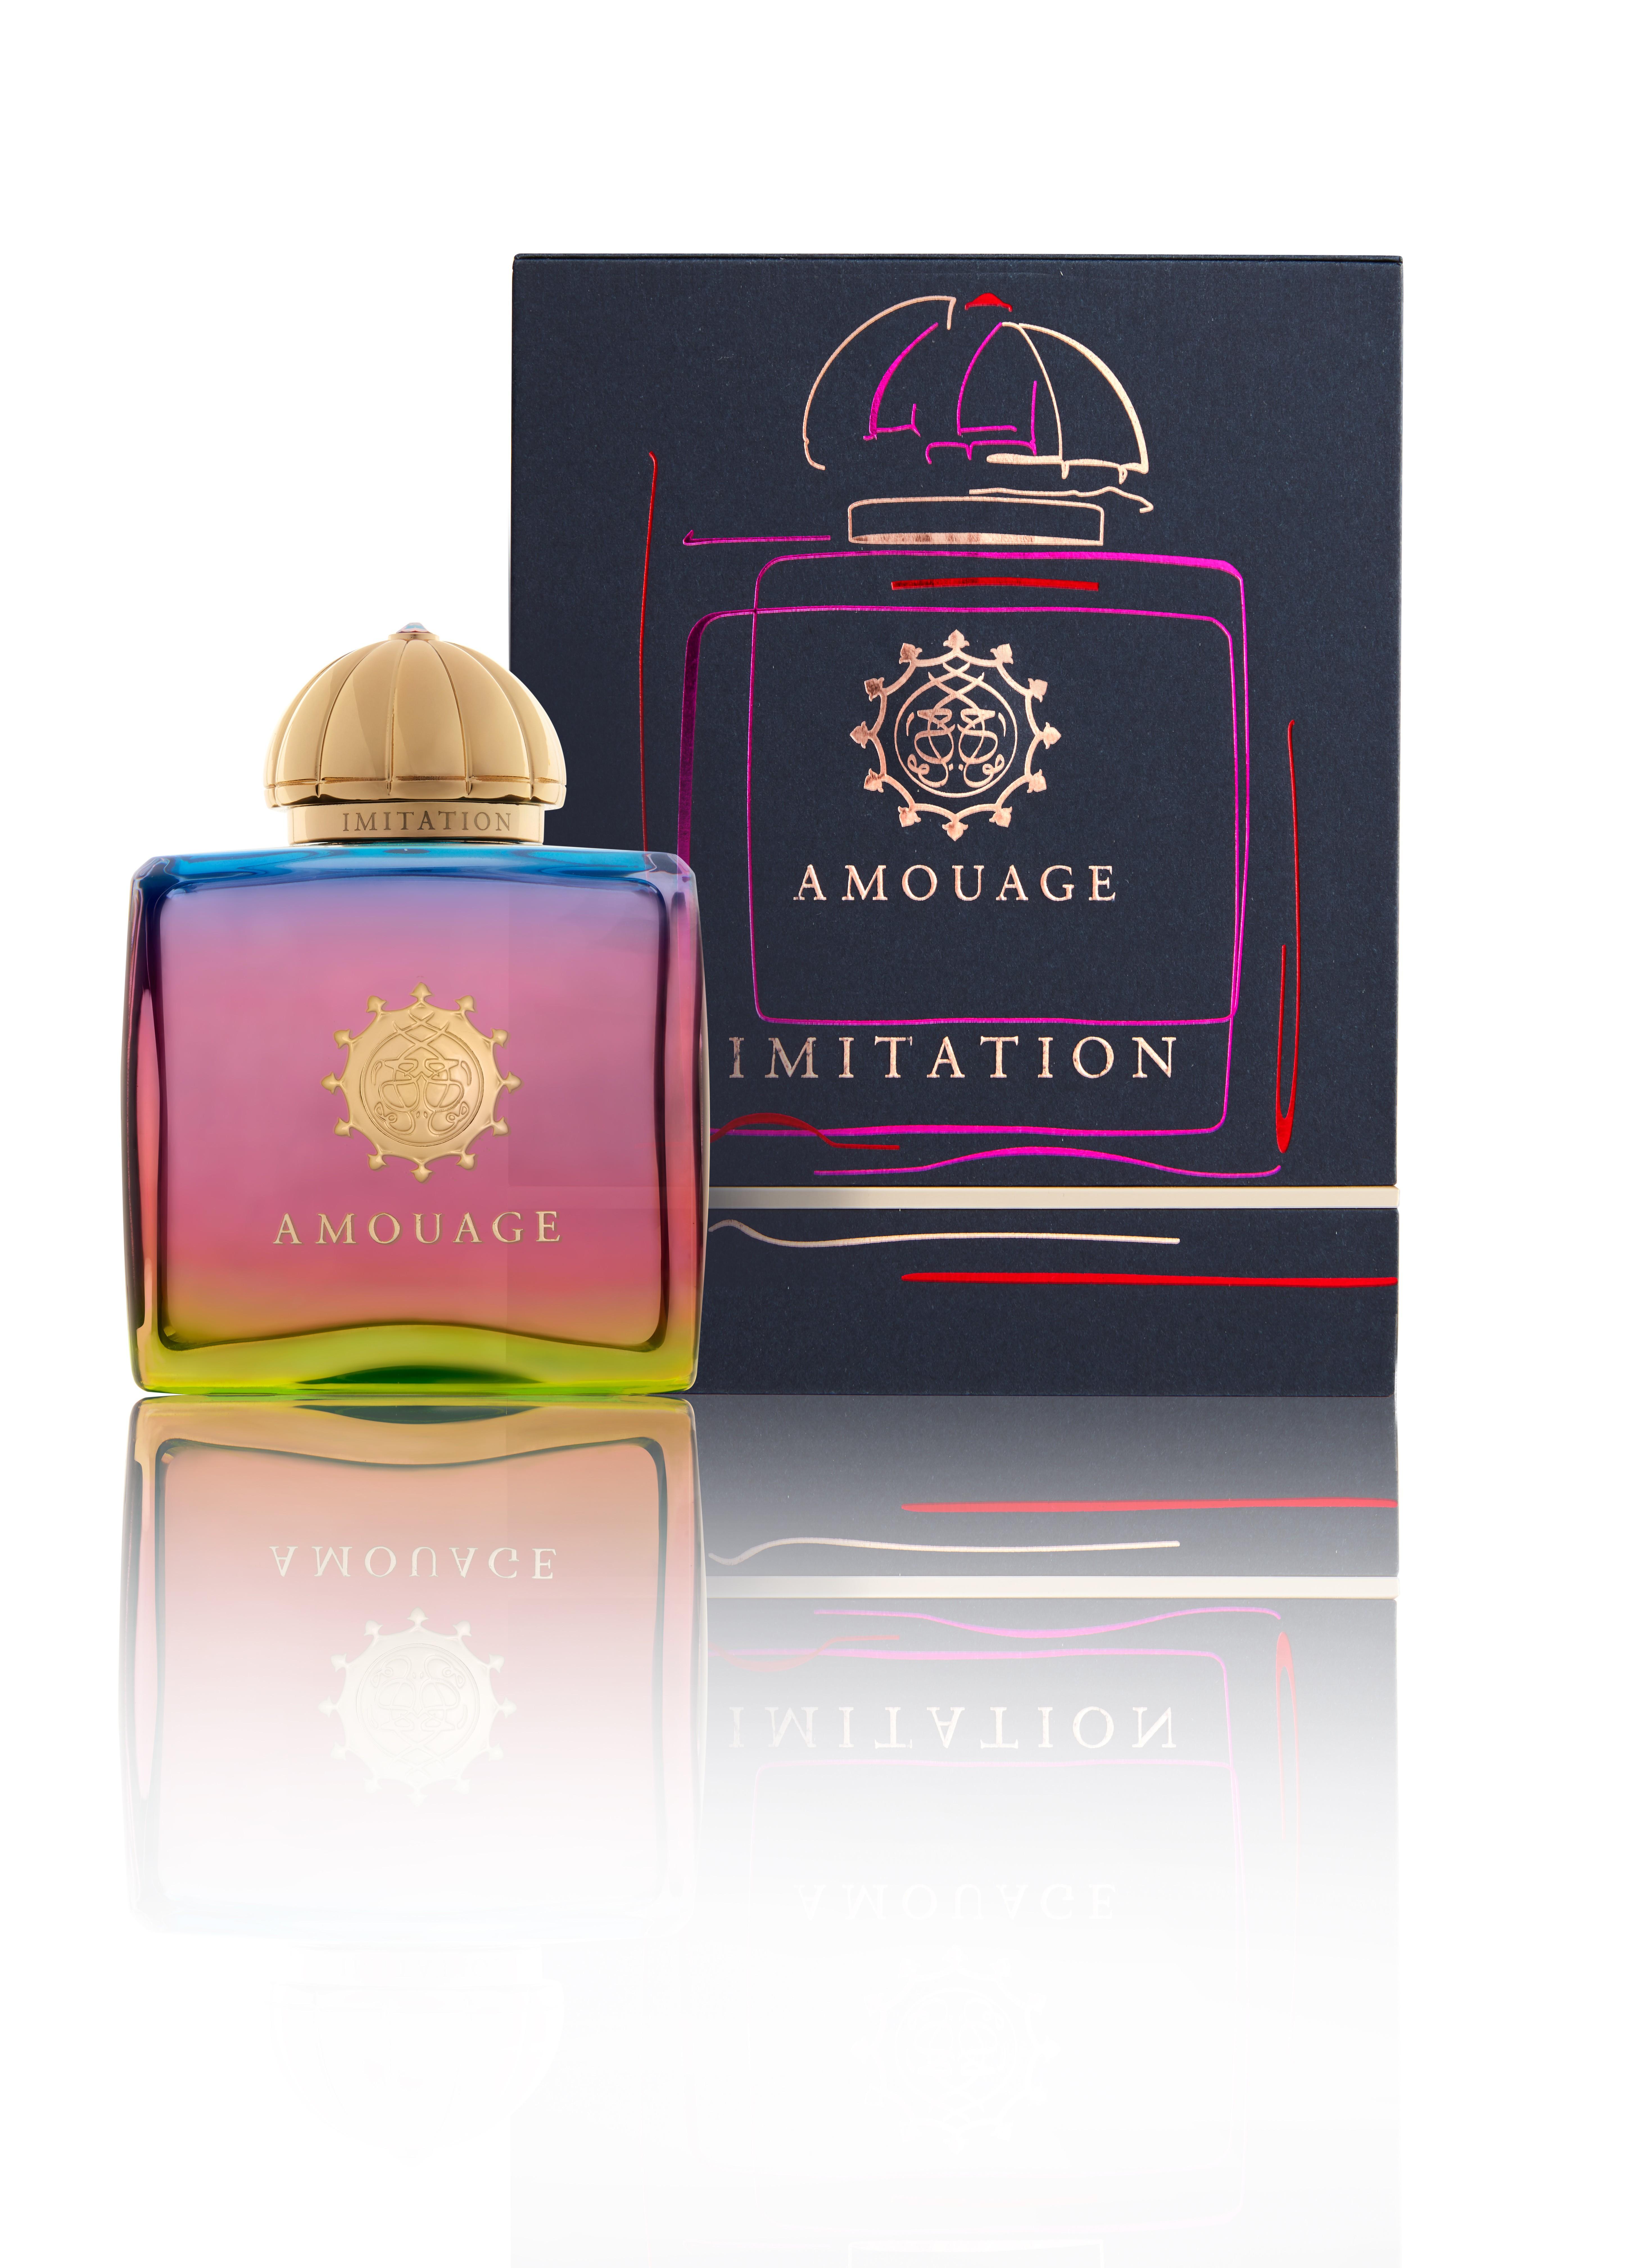 Amouage Imitation For Woman аромат для женщин